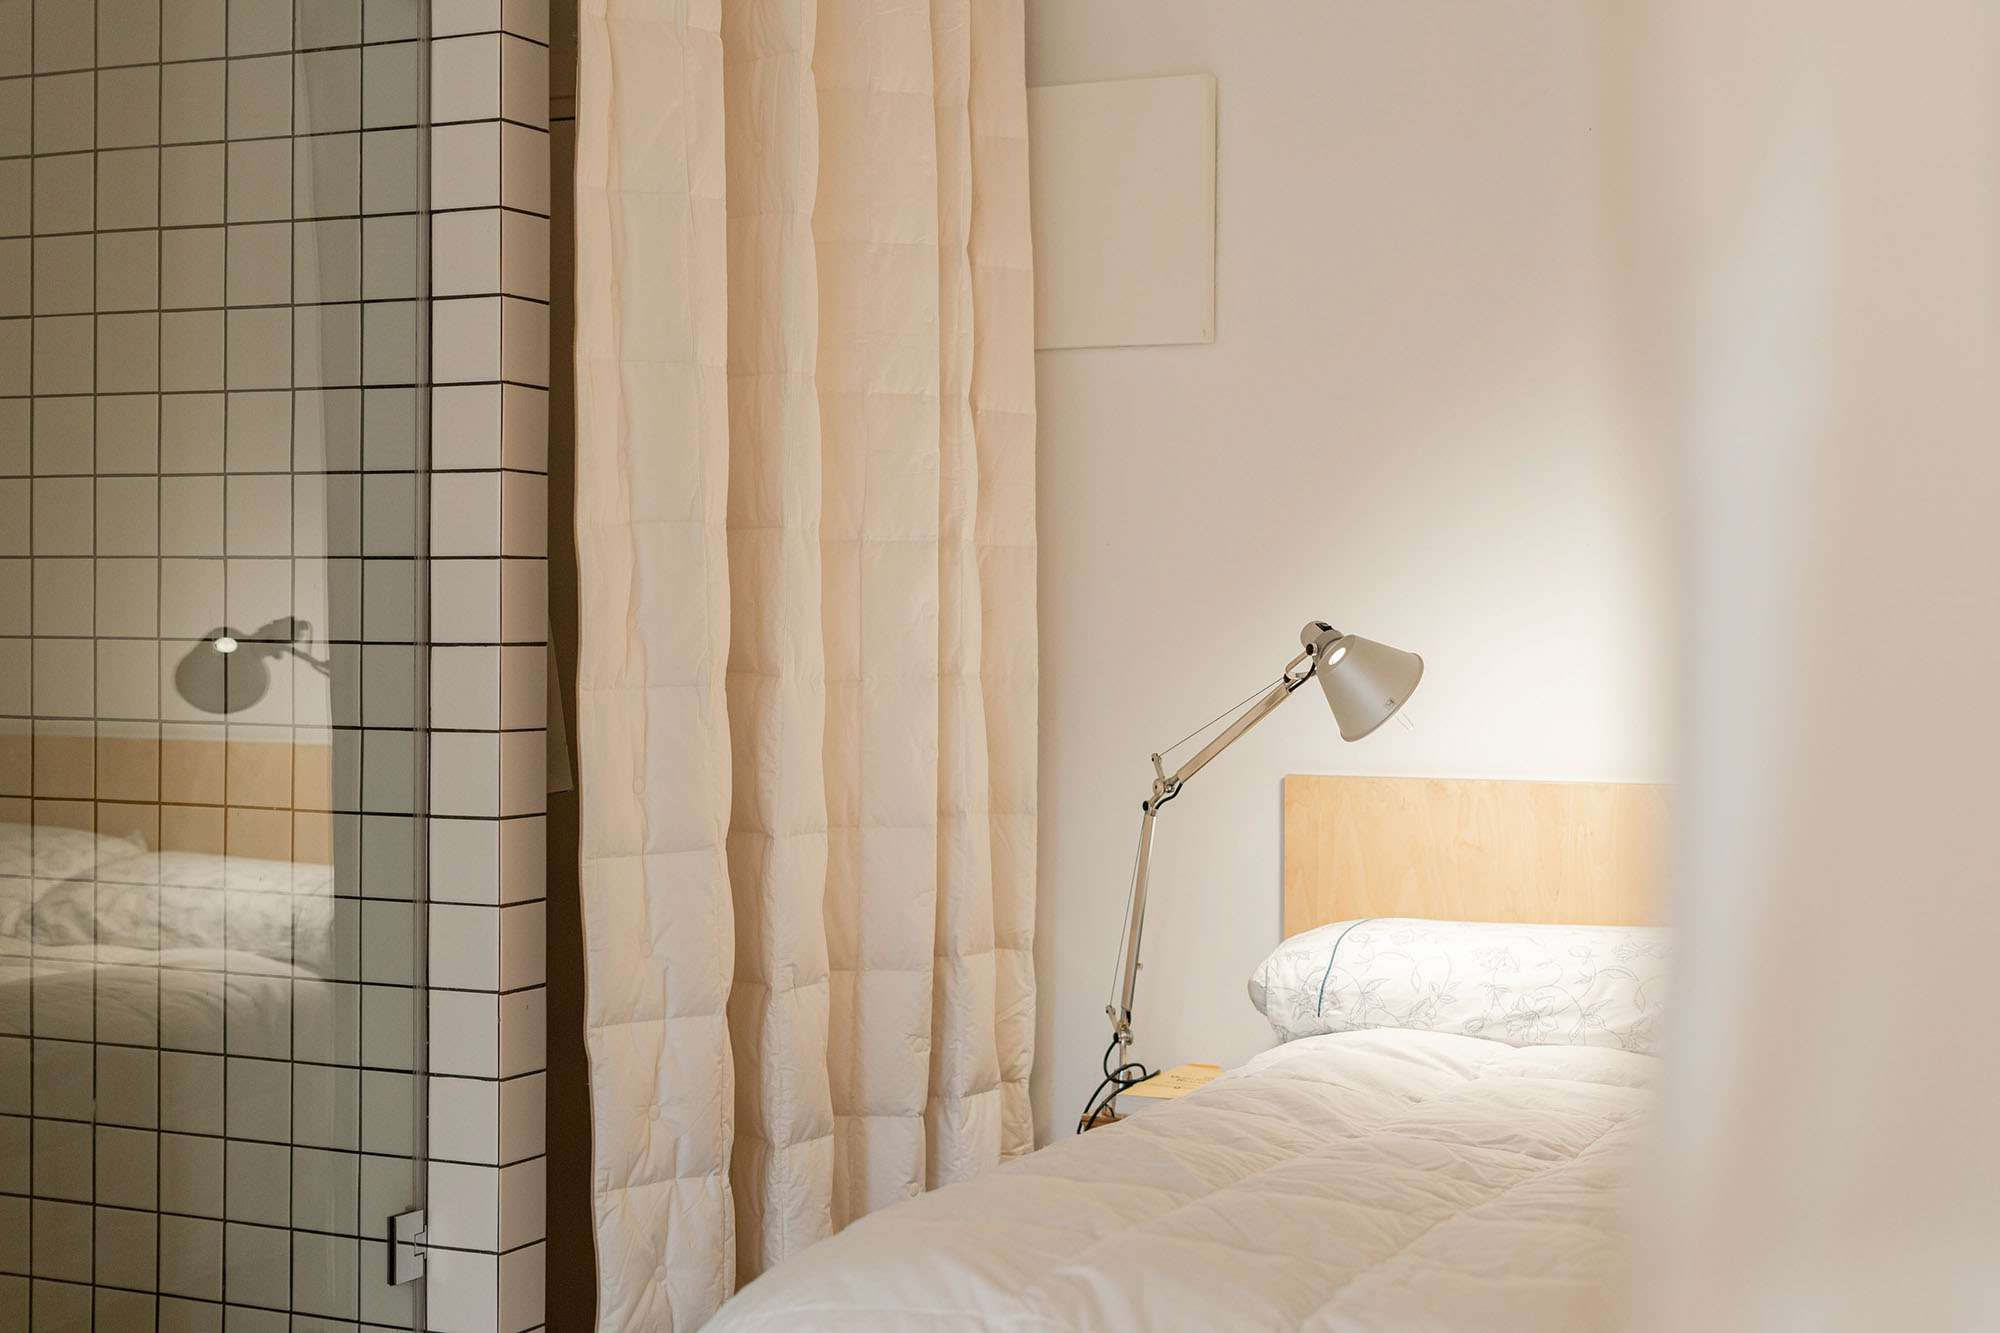 JM55 microapartment renovation by BURR Studio bedroom